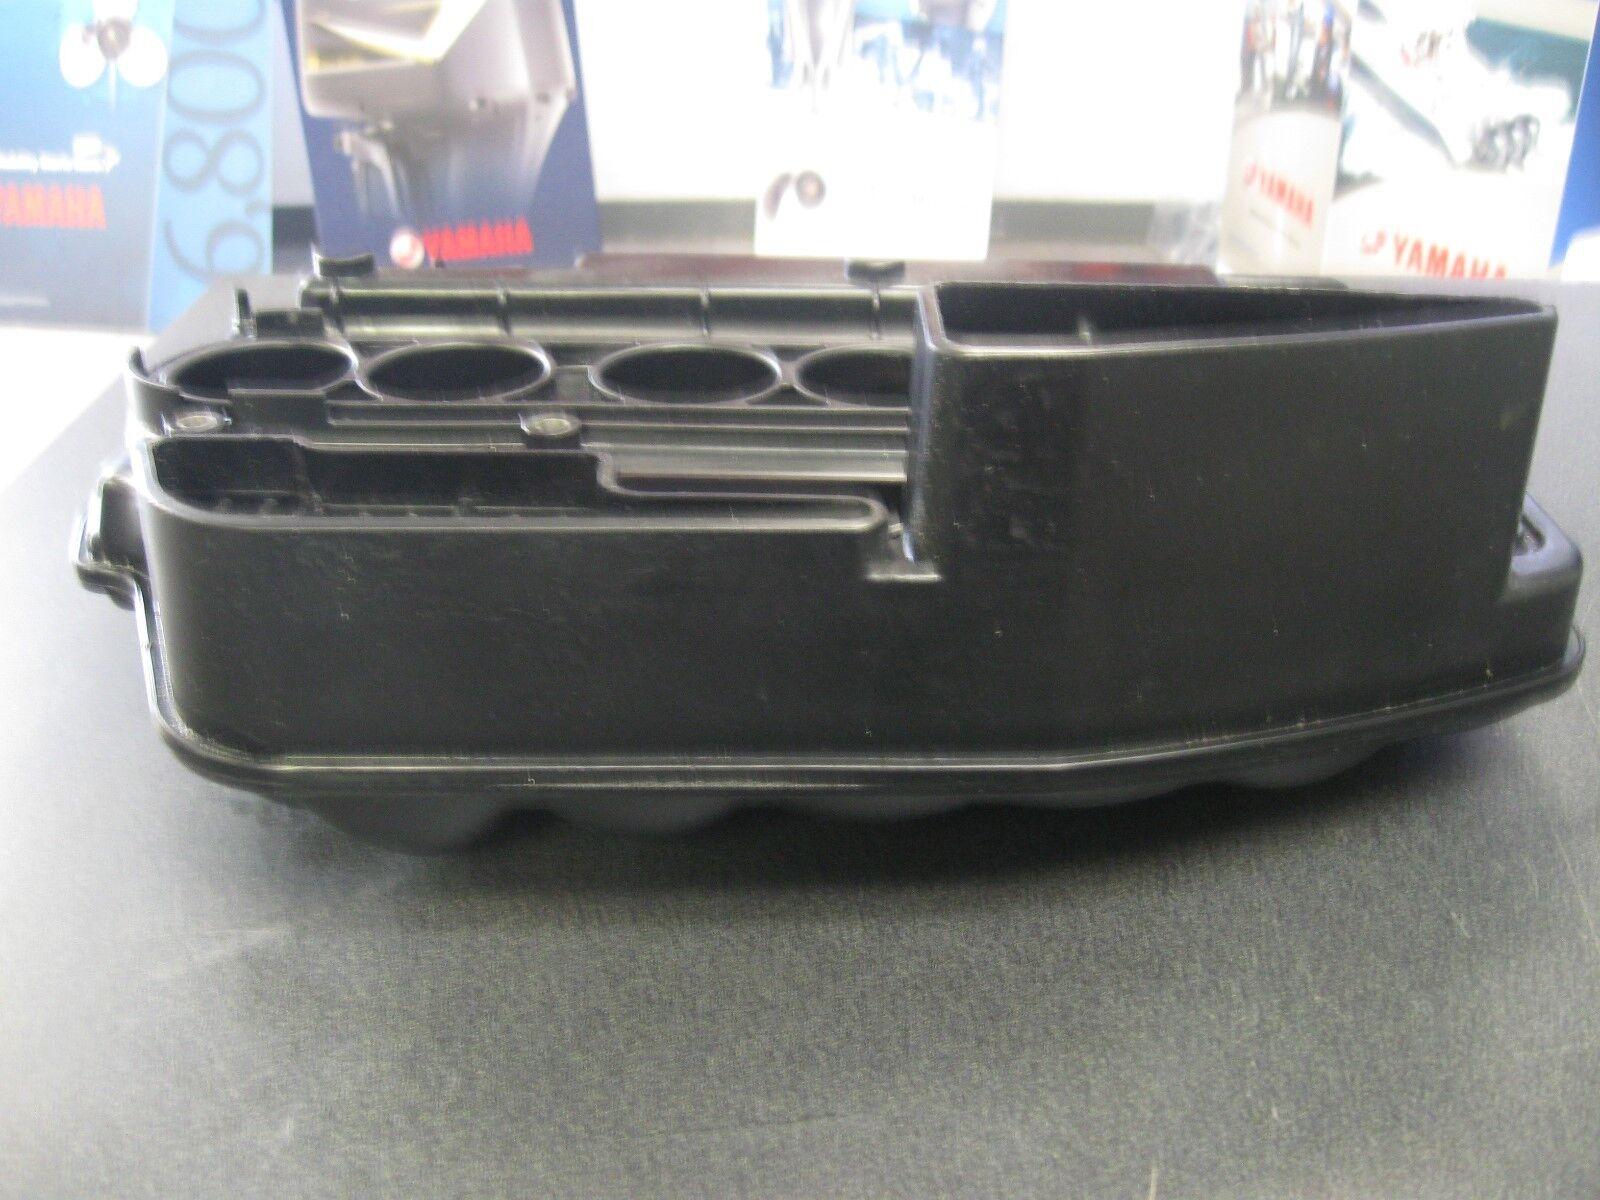 Yamaha Außenborder Silencer Assy Assy Assy Intake 60V-14440-00-00 448985